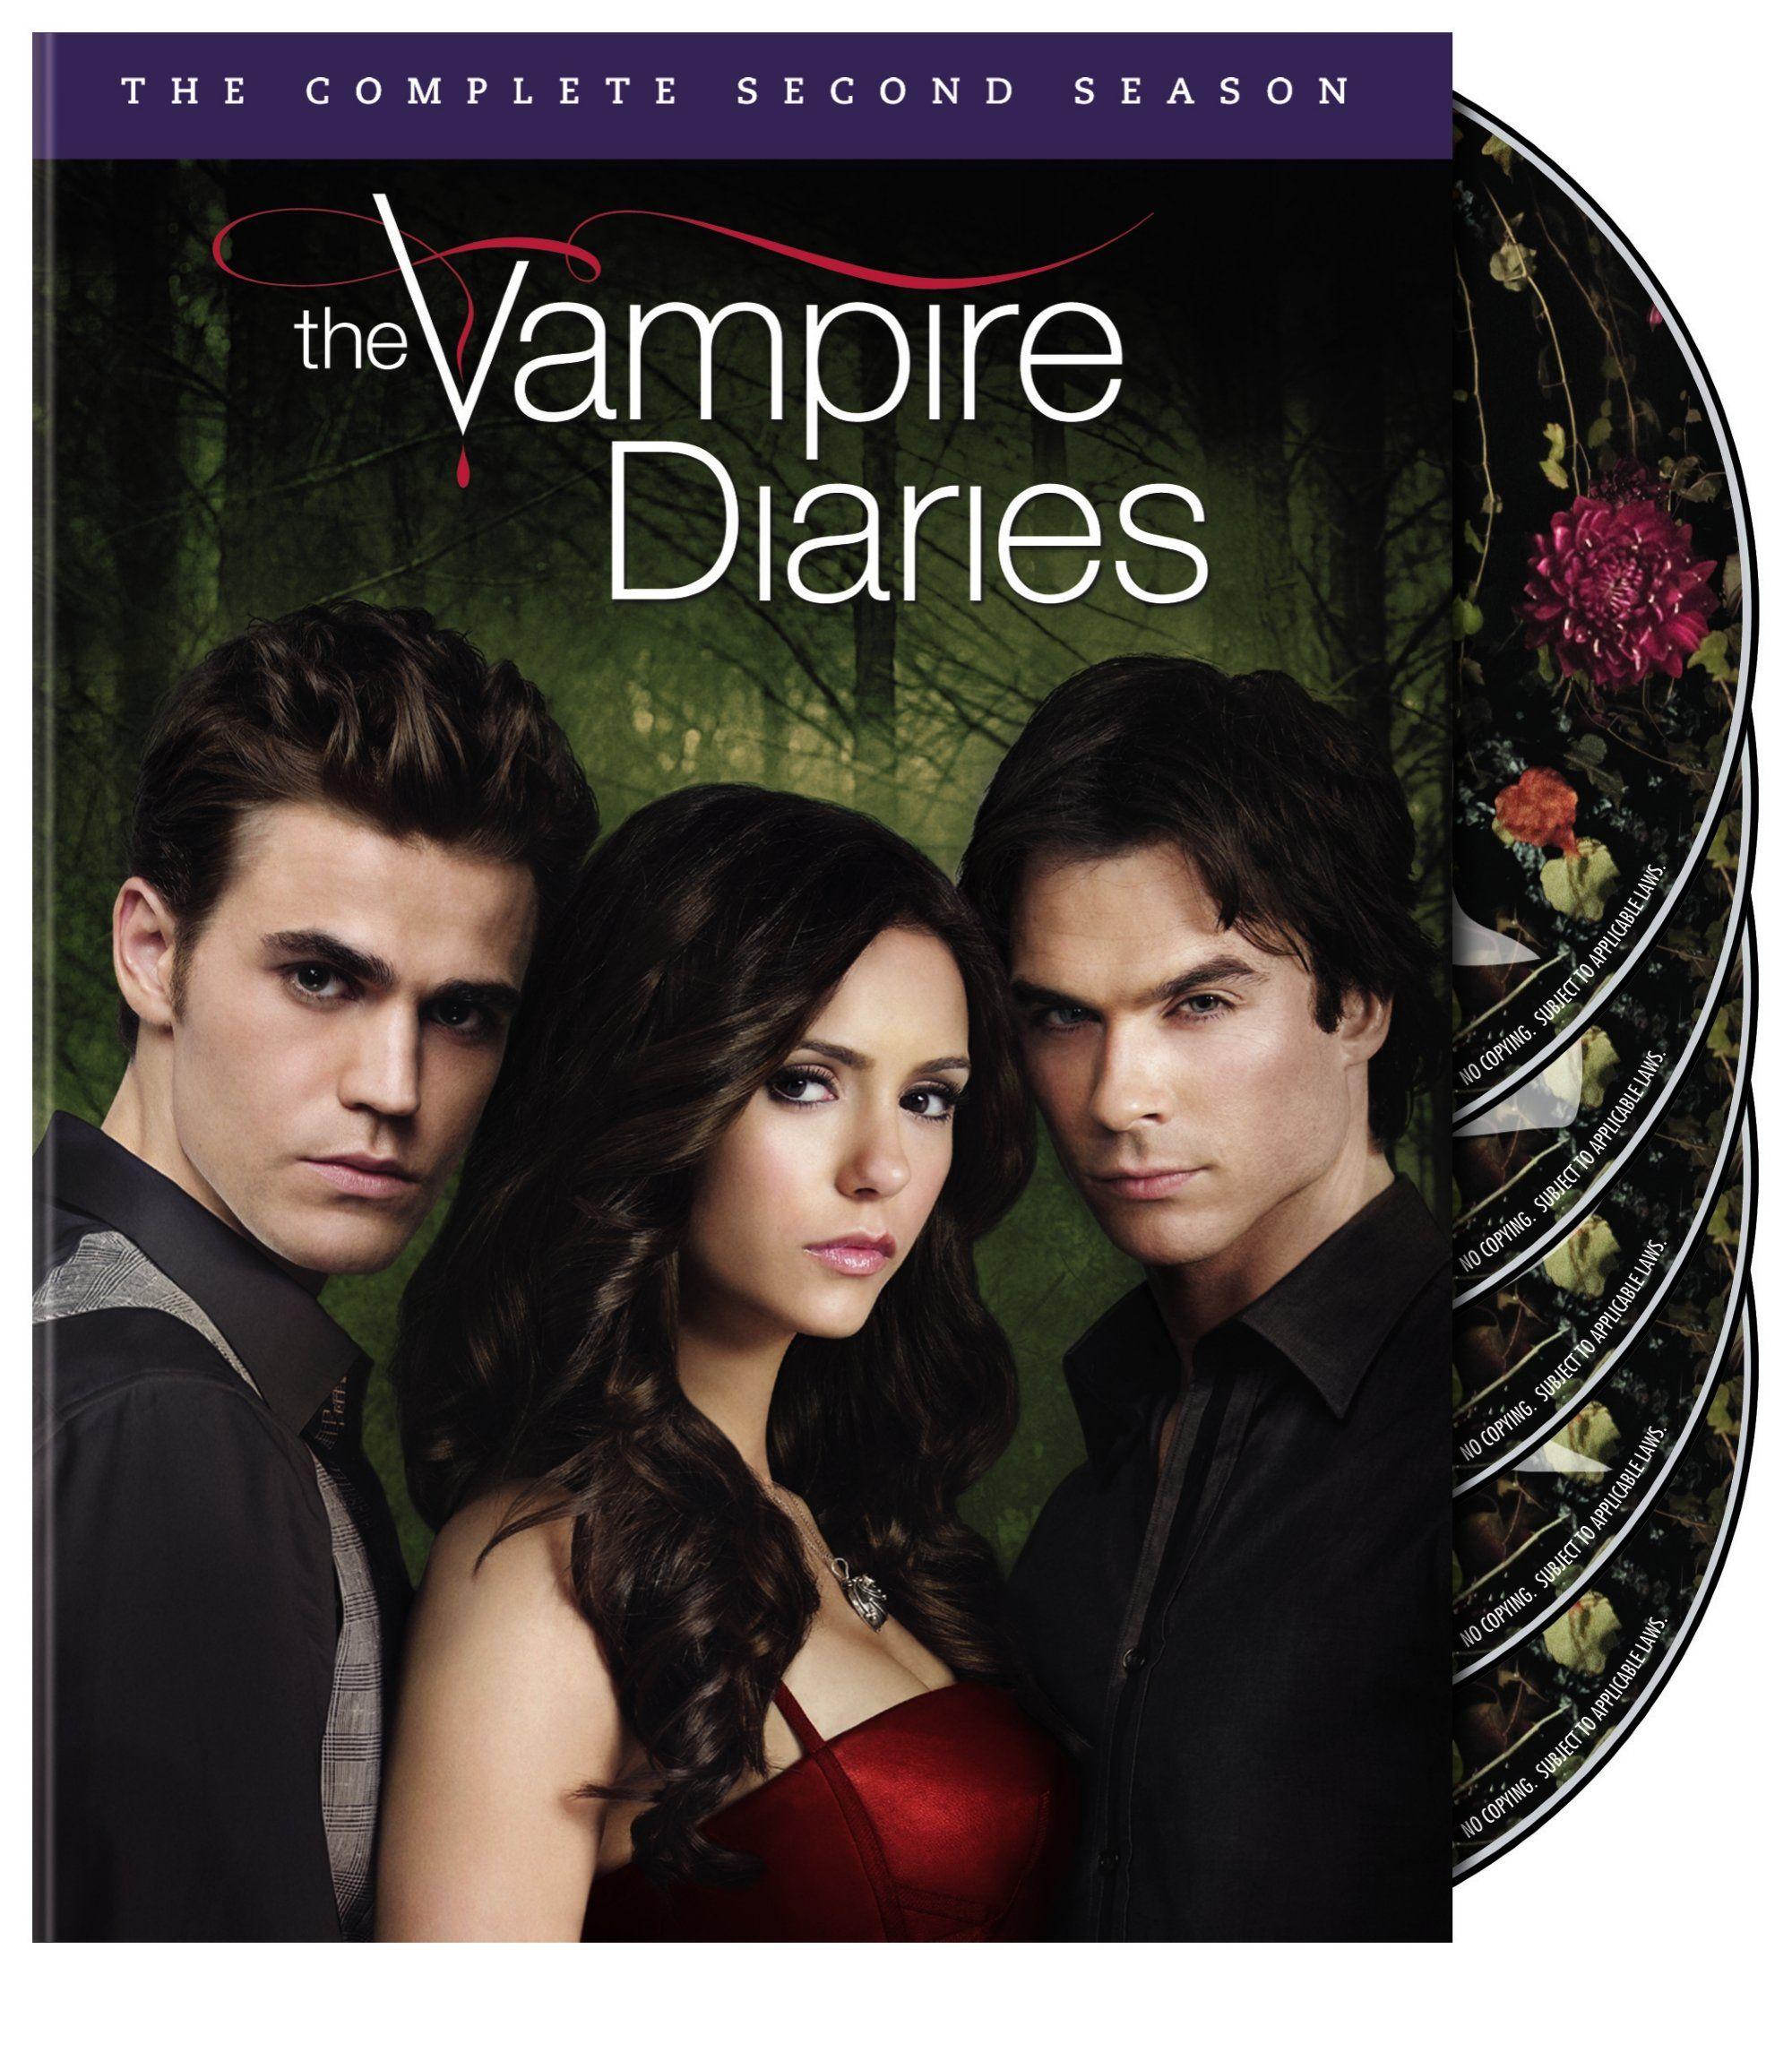 The Second Season Of The Vampire Diaries Finds Elena Nina Dobrev